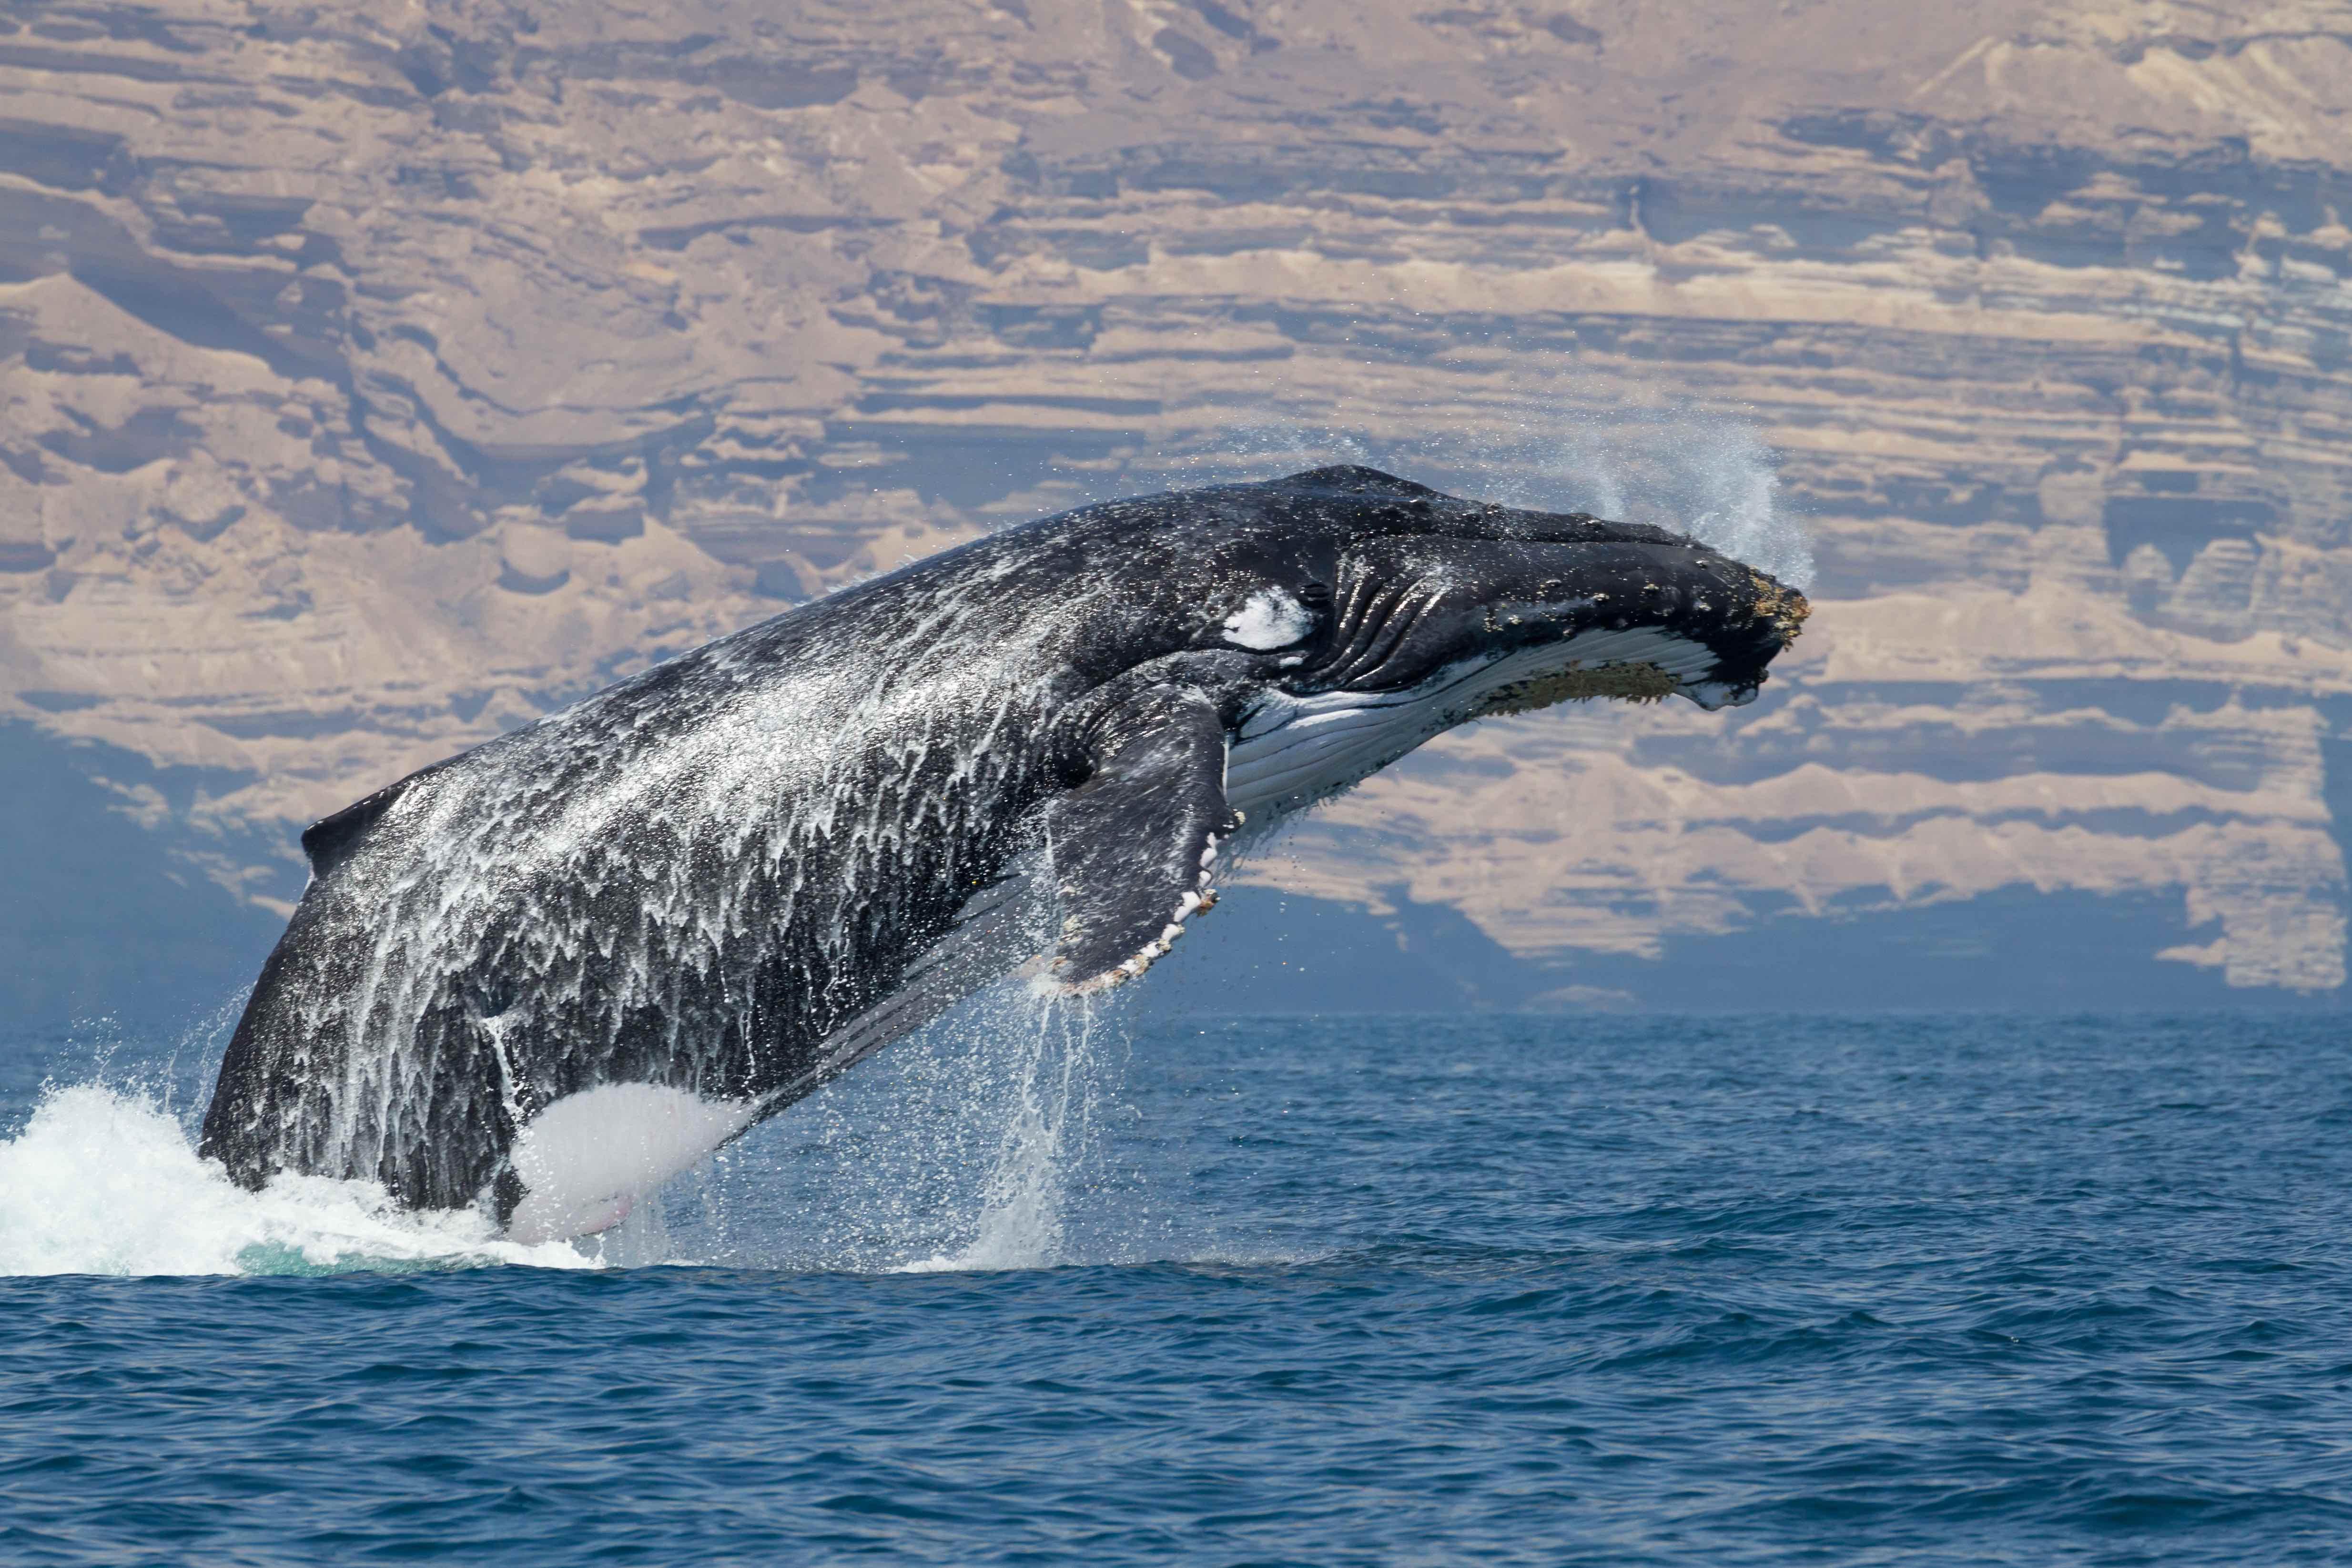 A humpback whale in the Arabian Sea. Credit: Darryl MacDonald